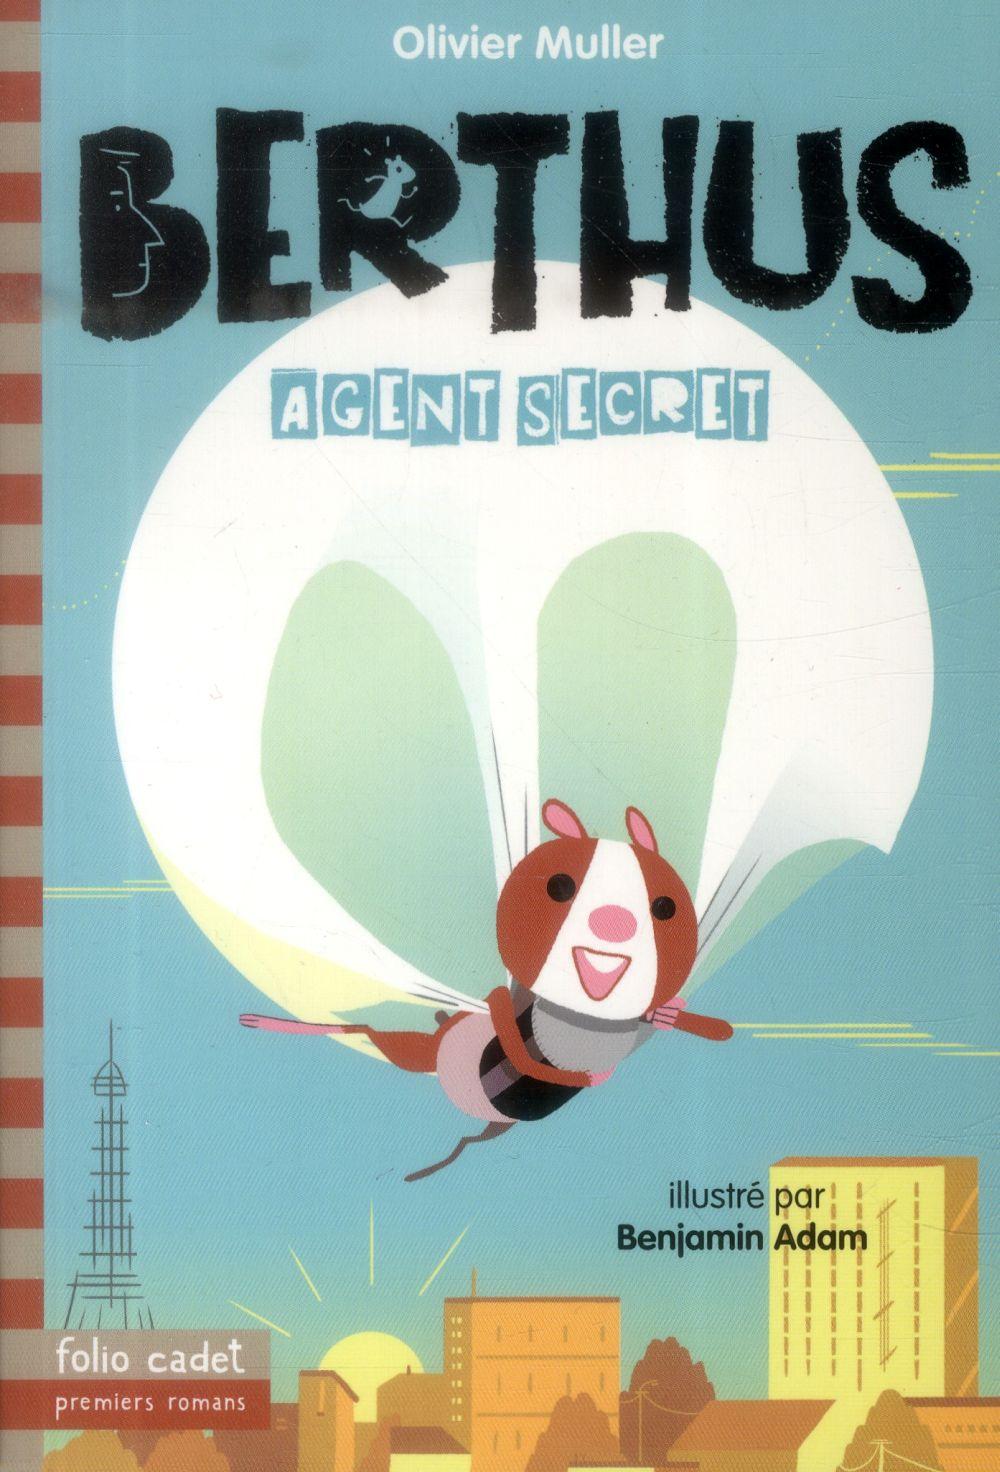 Berthus, agent secret